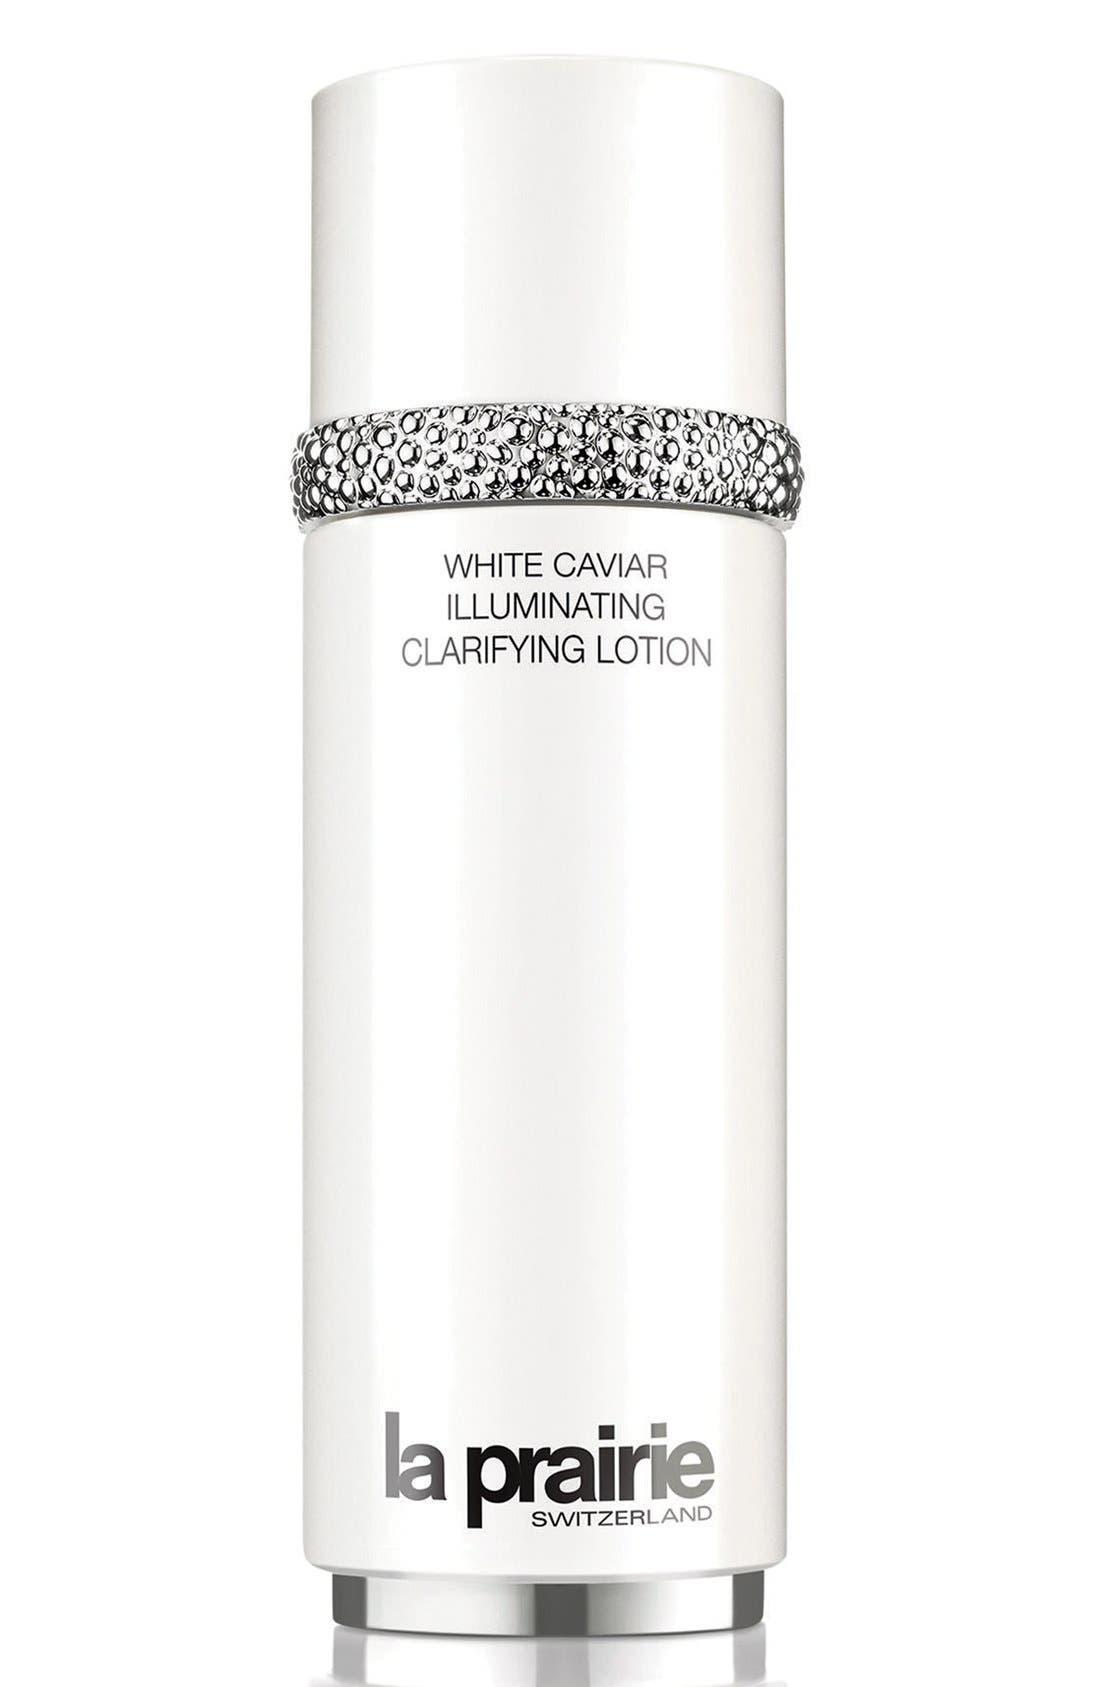 La Prairie White Caviar Illuminating Clarifying Lotion